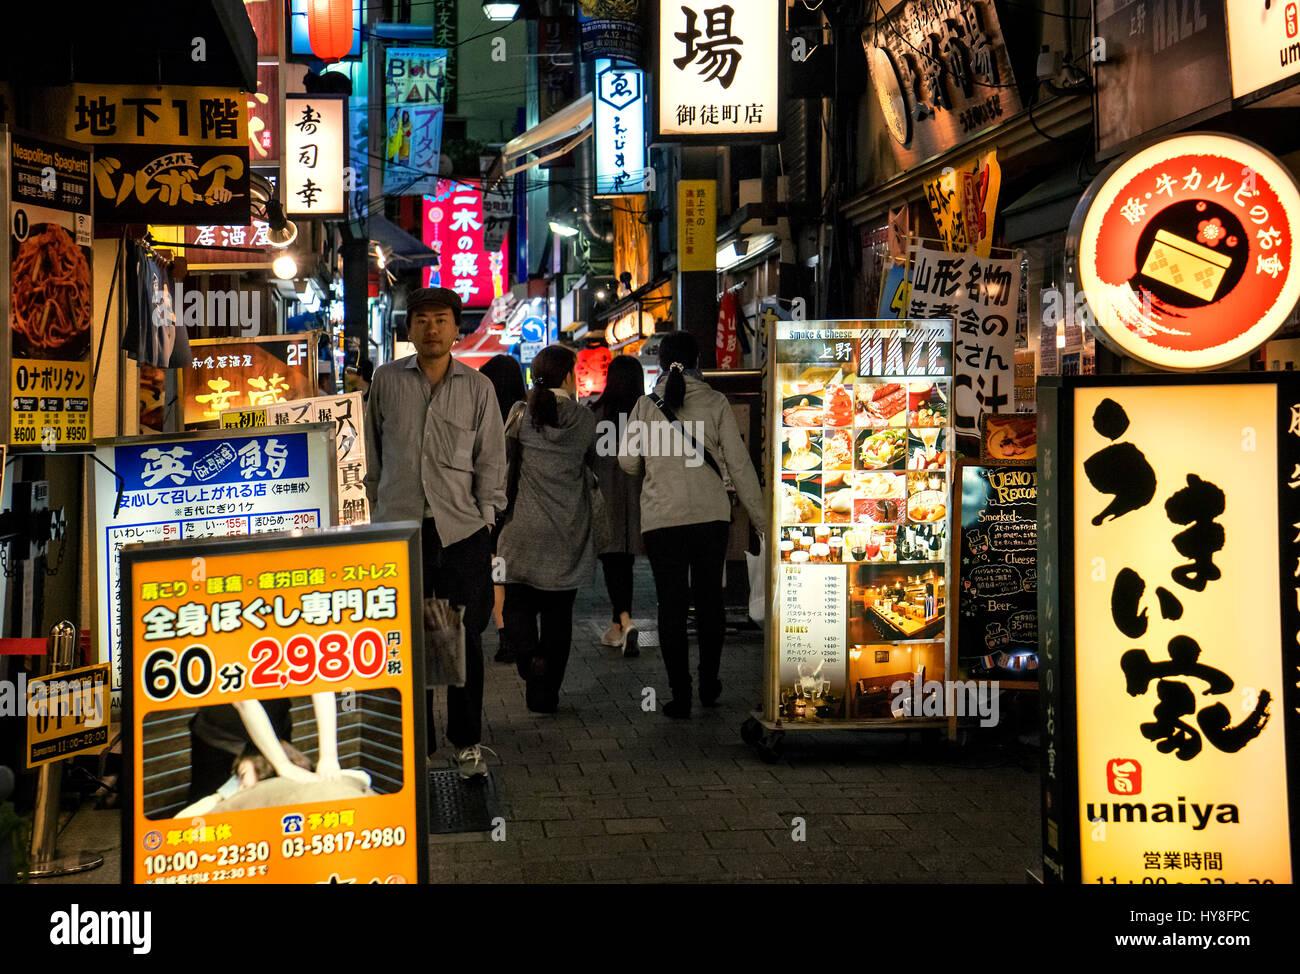 La isla de Japón, Honshu, Kanto, Tokio, por las calles de Ueno por la noche. Imagen De Stock